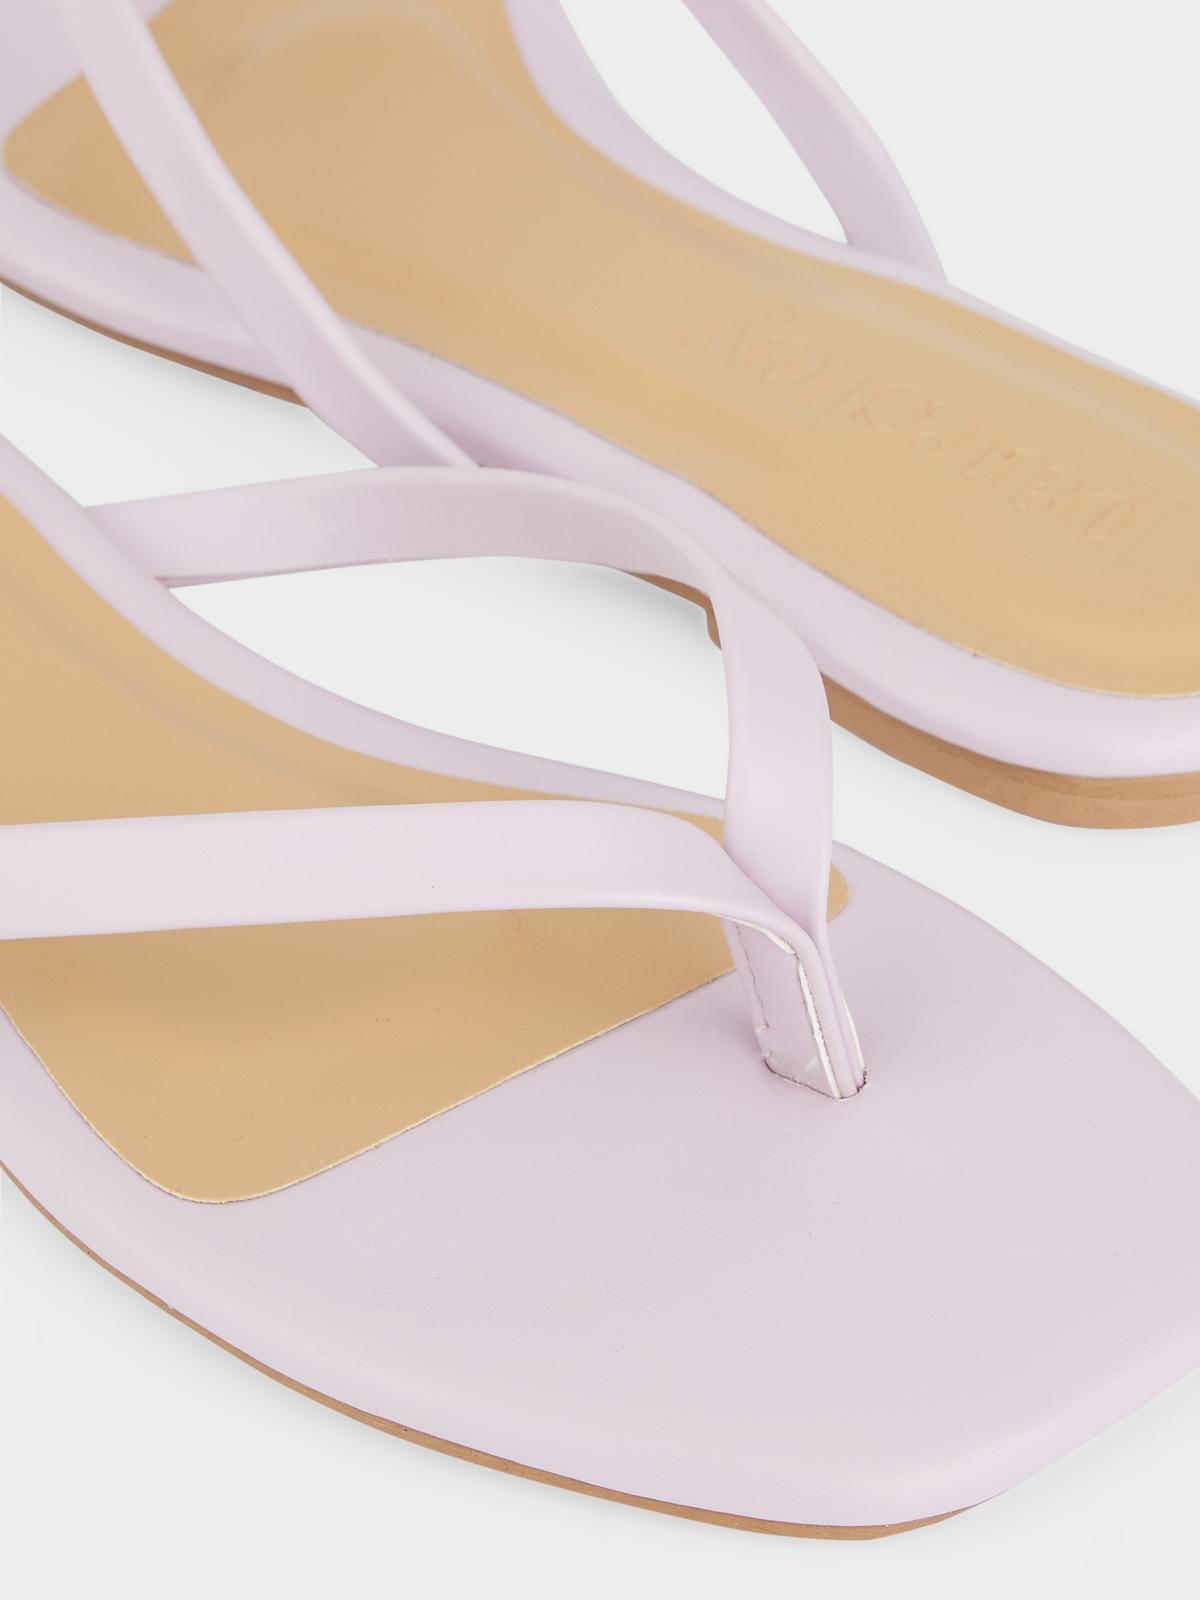 The Parsley Market Bare Sandals Lavender